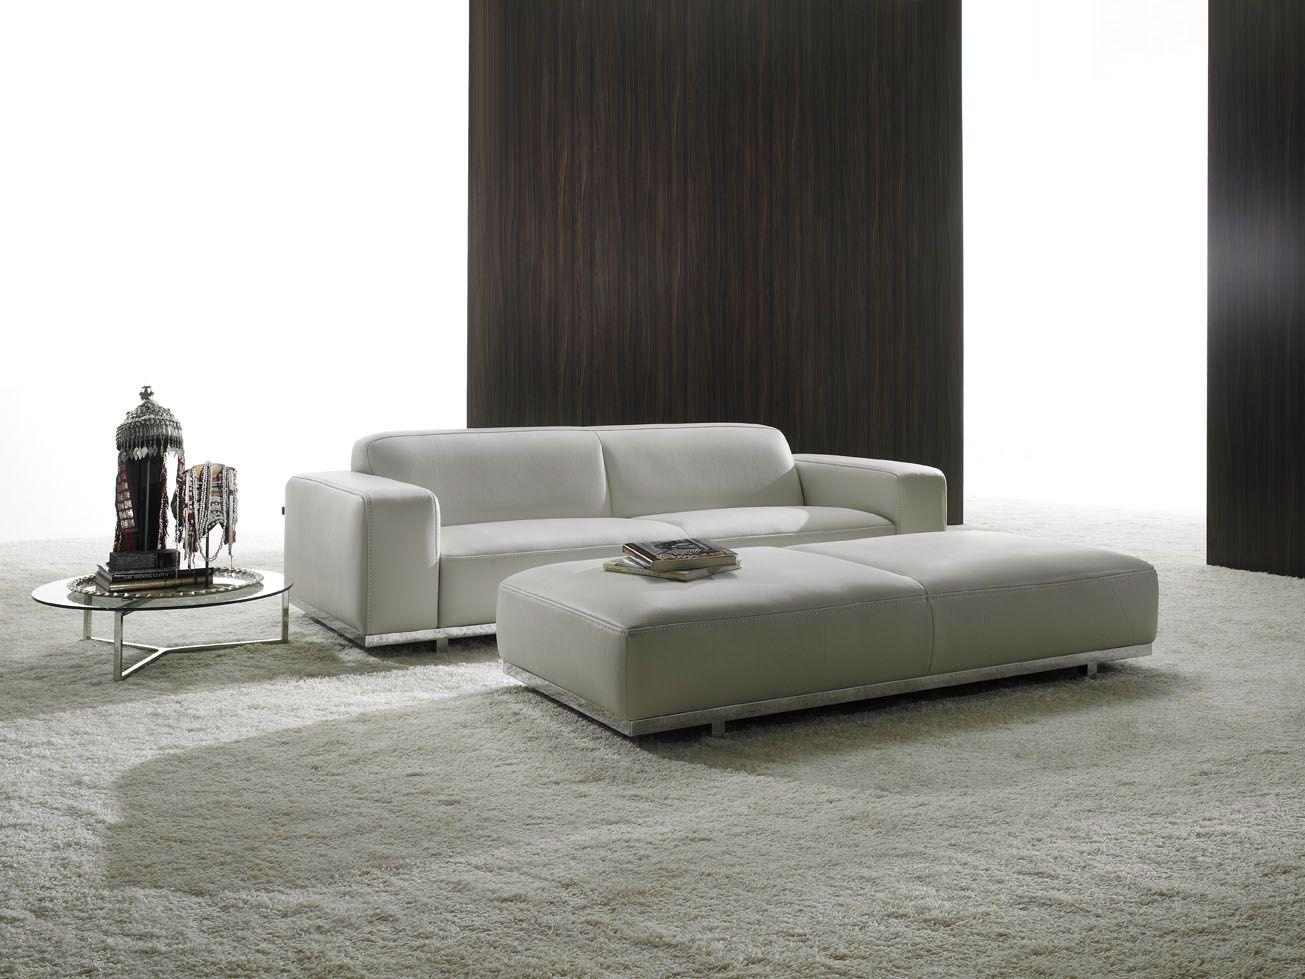 Round Sofa Bed White Sofa Bed For Minimalis Modern